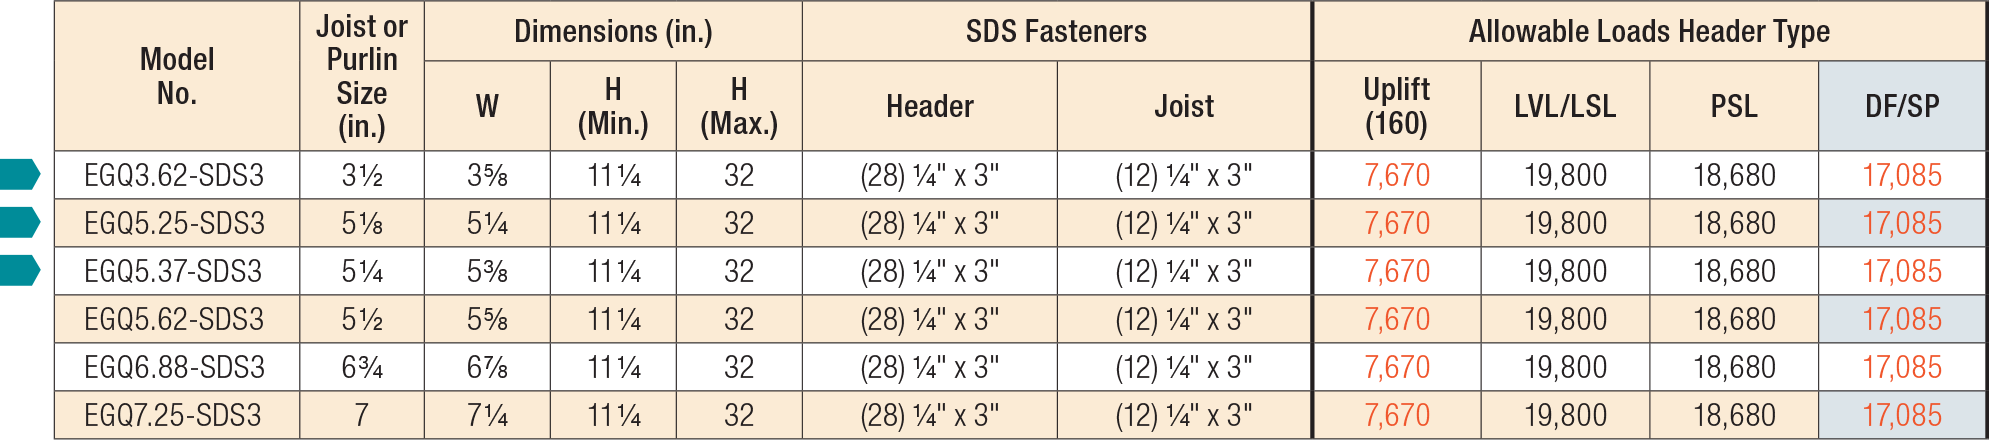 EGQ High-Capacity Top-Flange Hanger Load Table